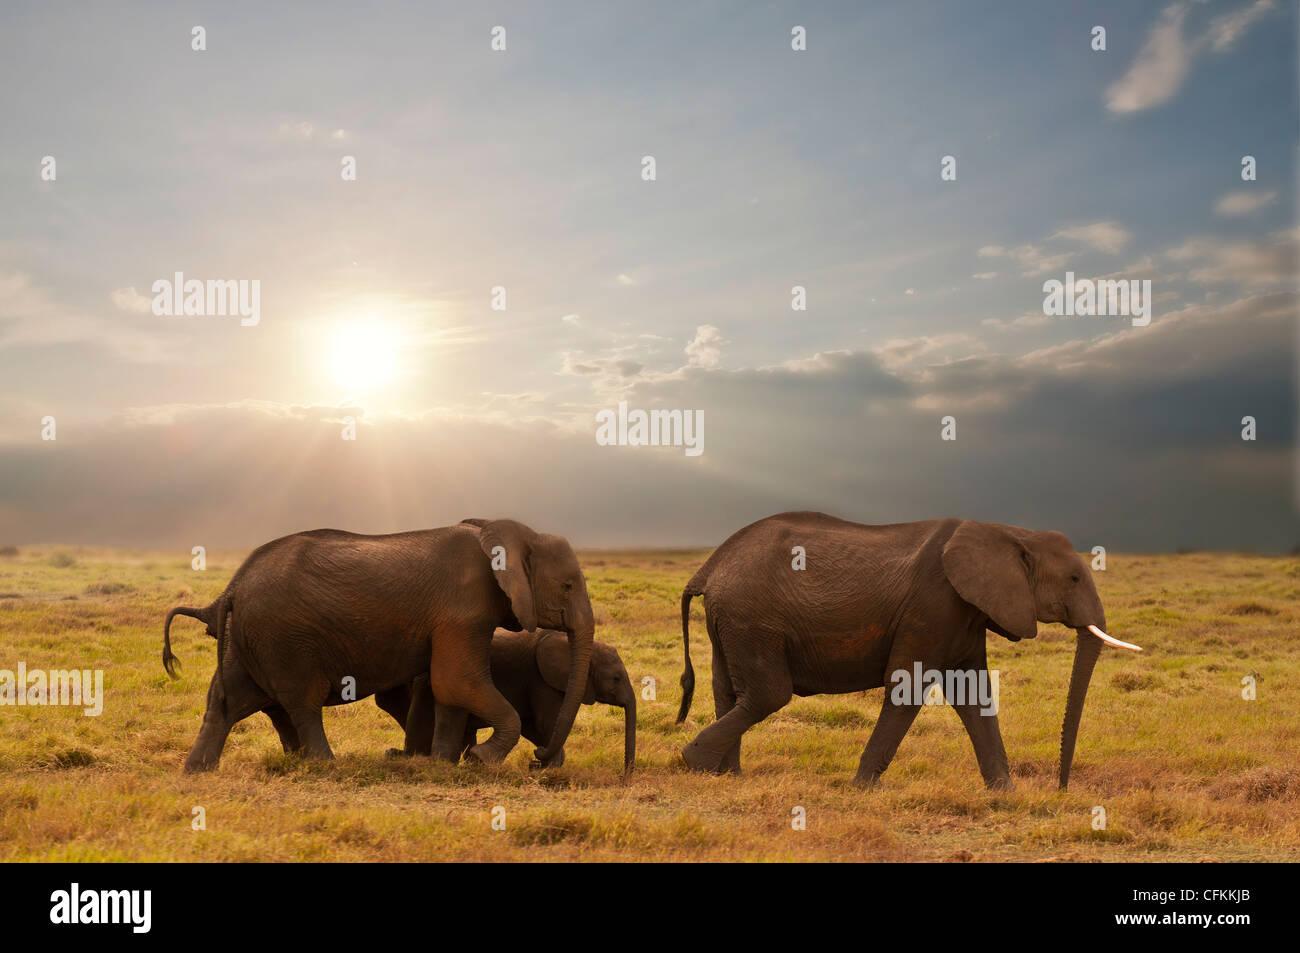 Familia de elefantes en el Parque Nacional Amboseli, Kenia Foto de stock